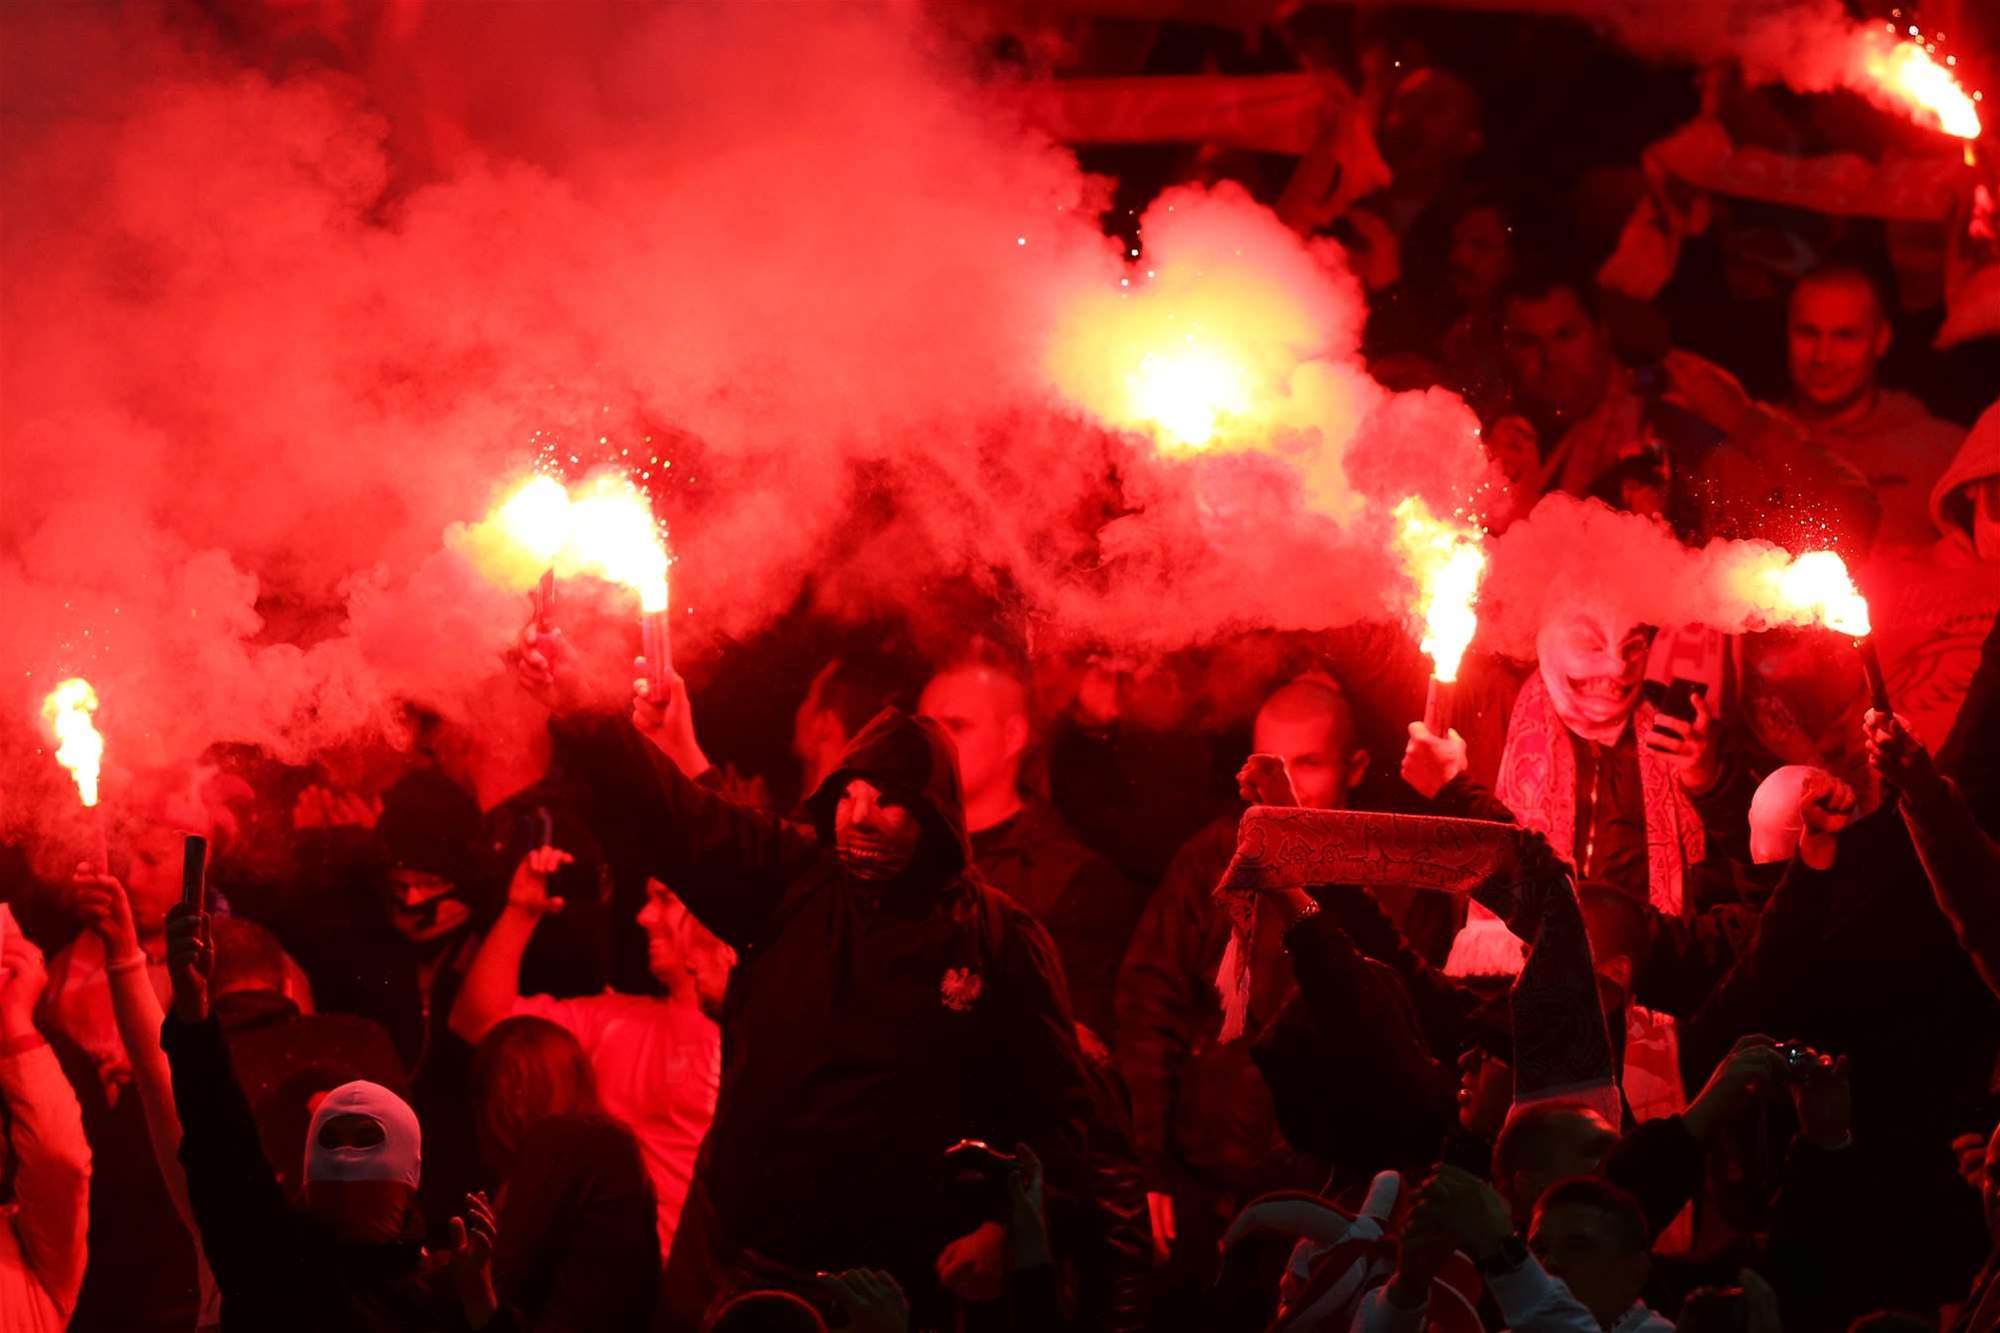 Poland, England punished for Wembley incidents